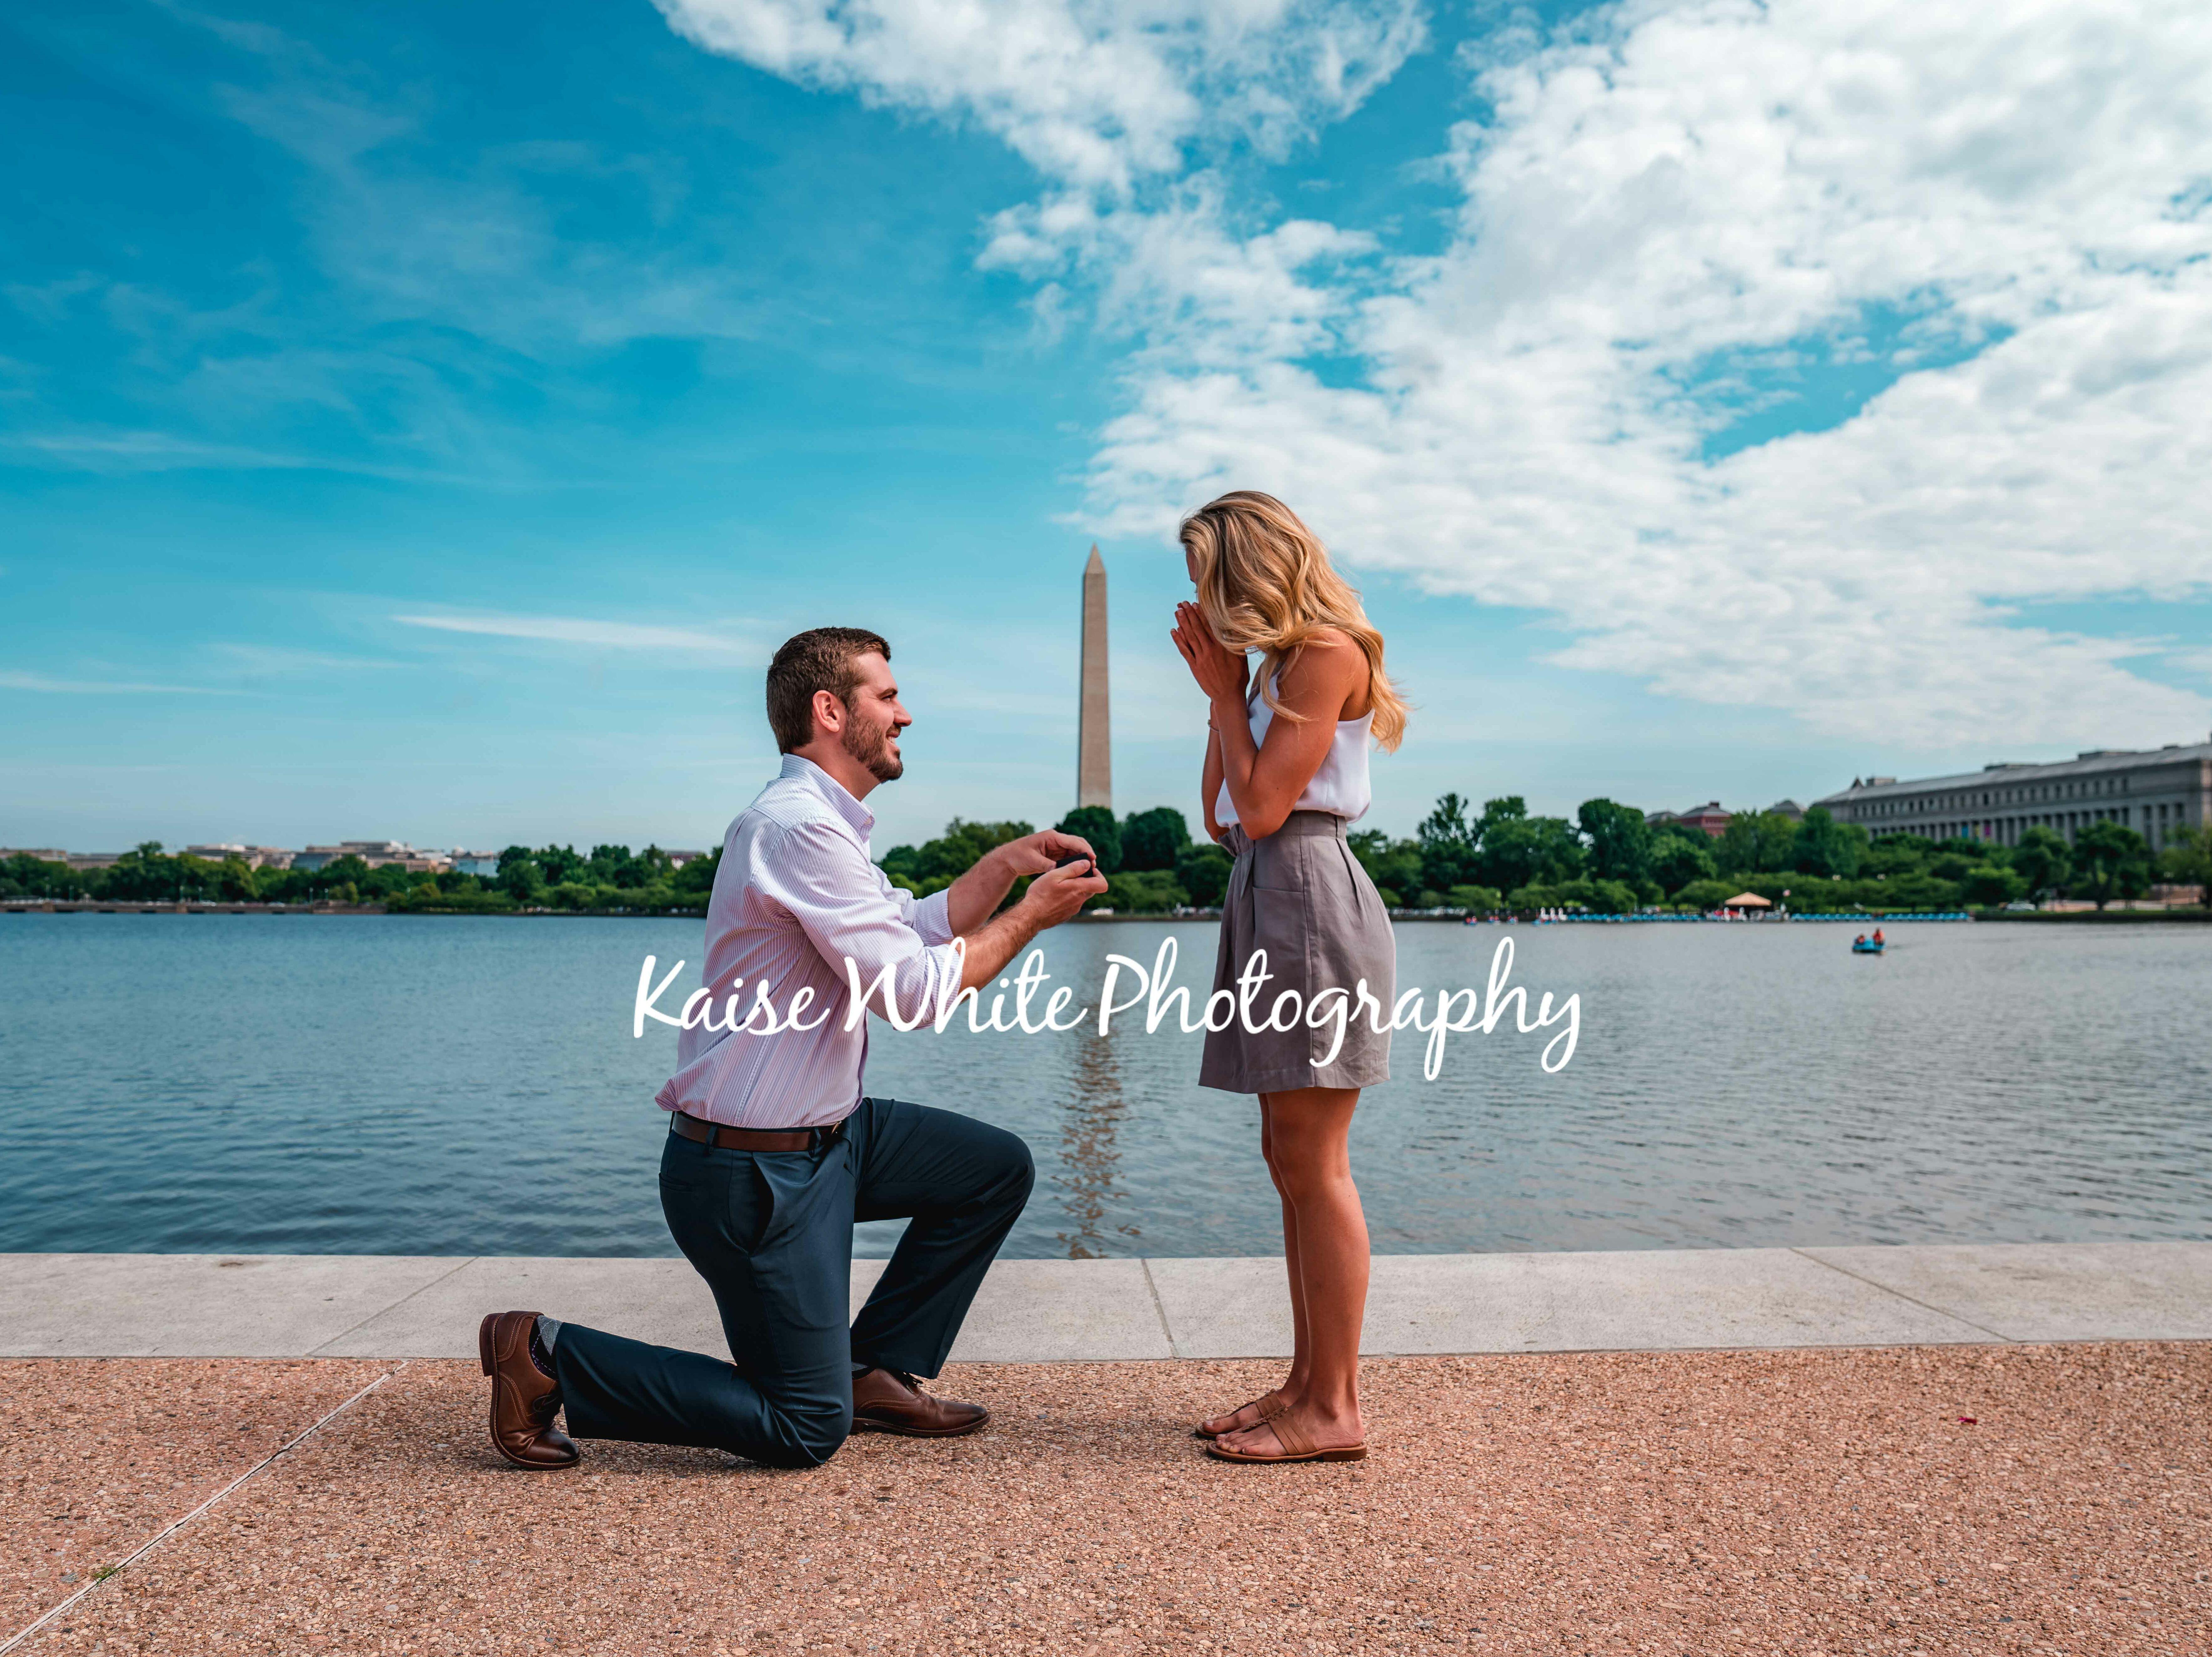 Kaise White Photography & Enso Media Firm - Photographer - Washington, DC